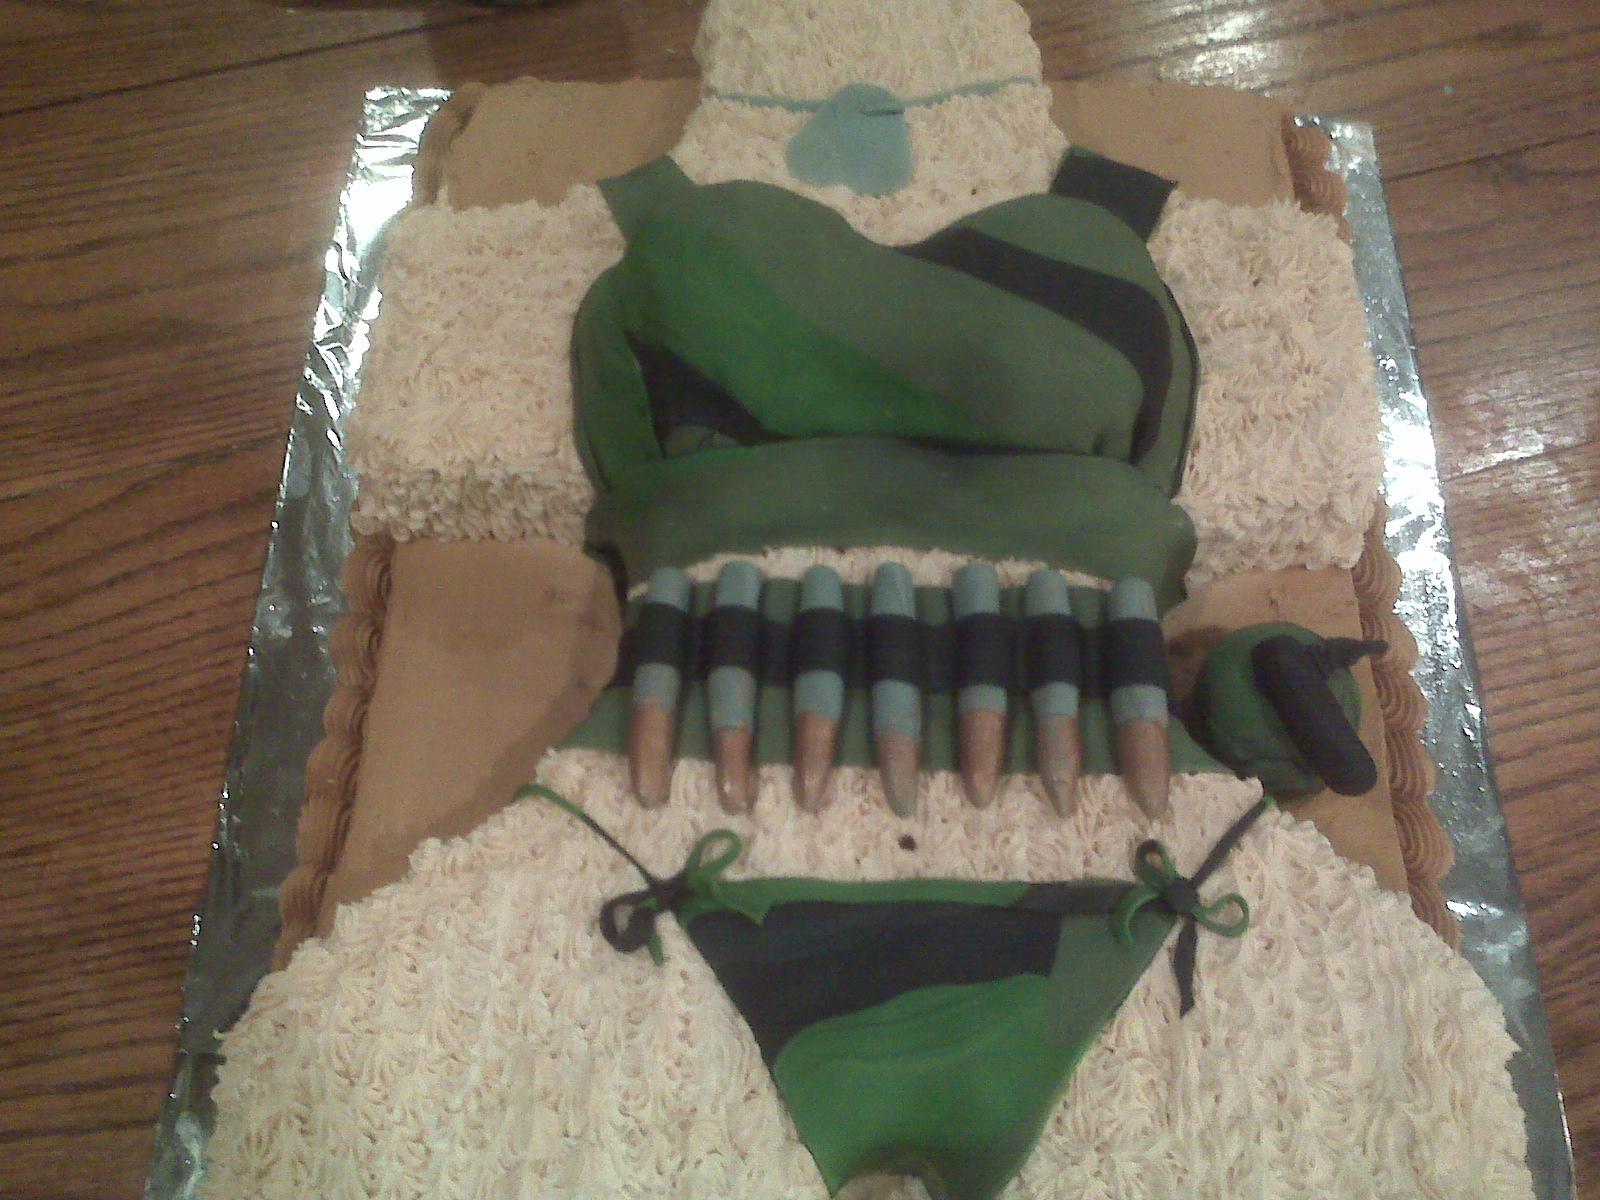 Camoflage Birthday Cakes